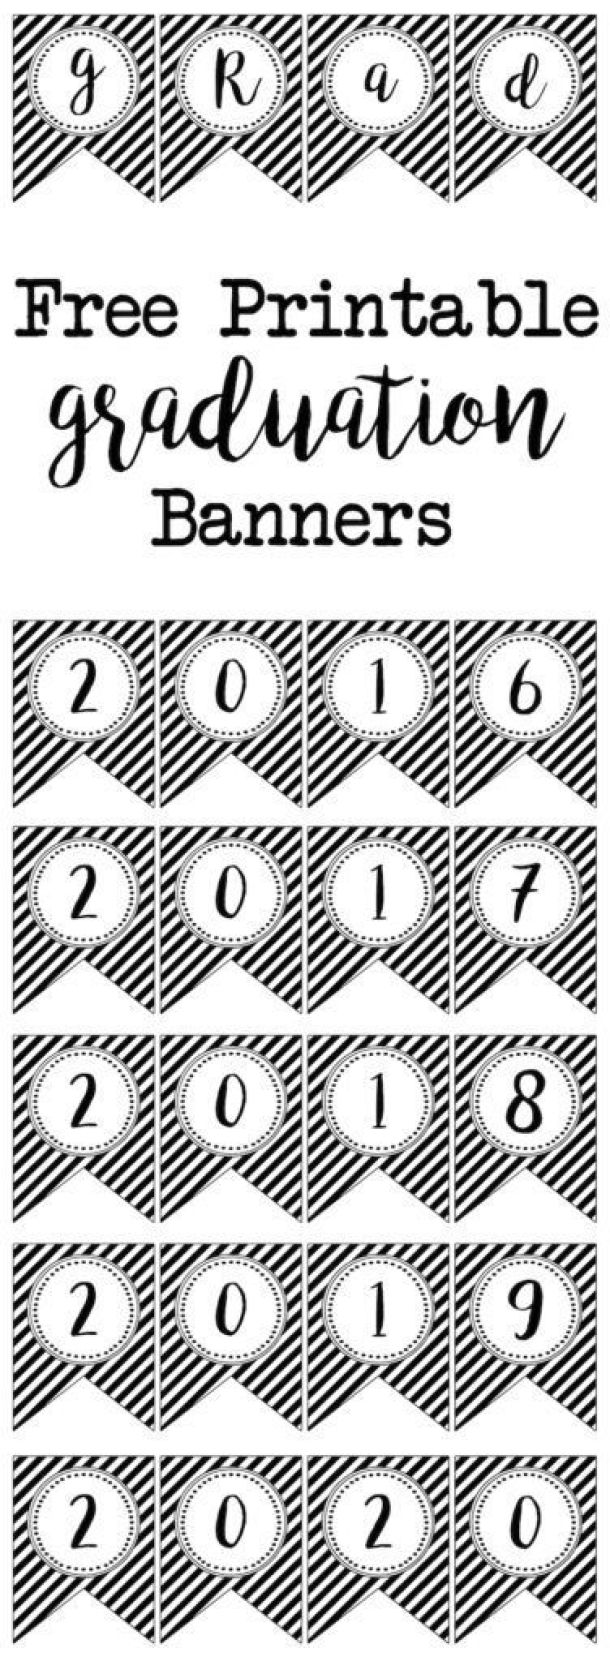 Free Printable Graduation Banners by Paper Trail Design | 10 Graduation Party Decoration Ideas